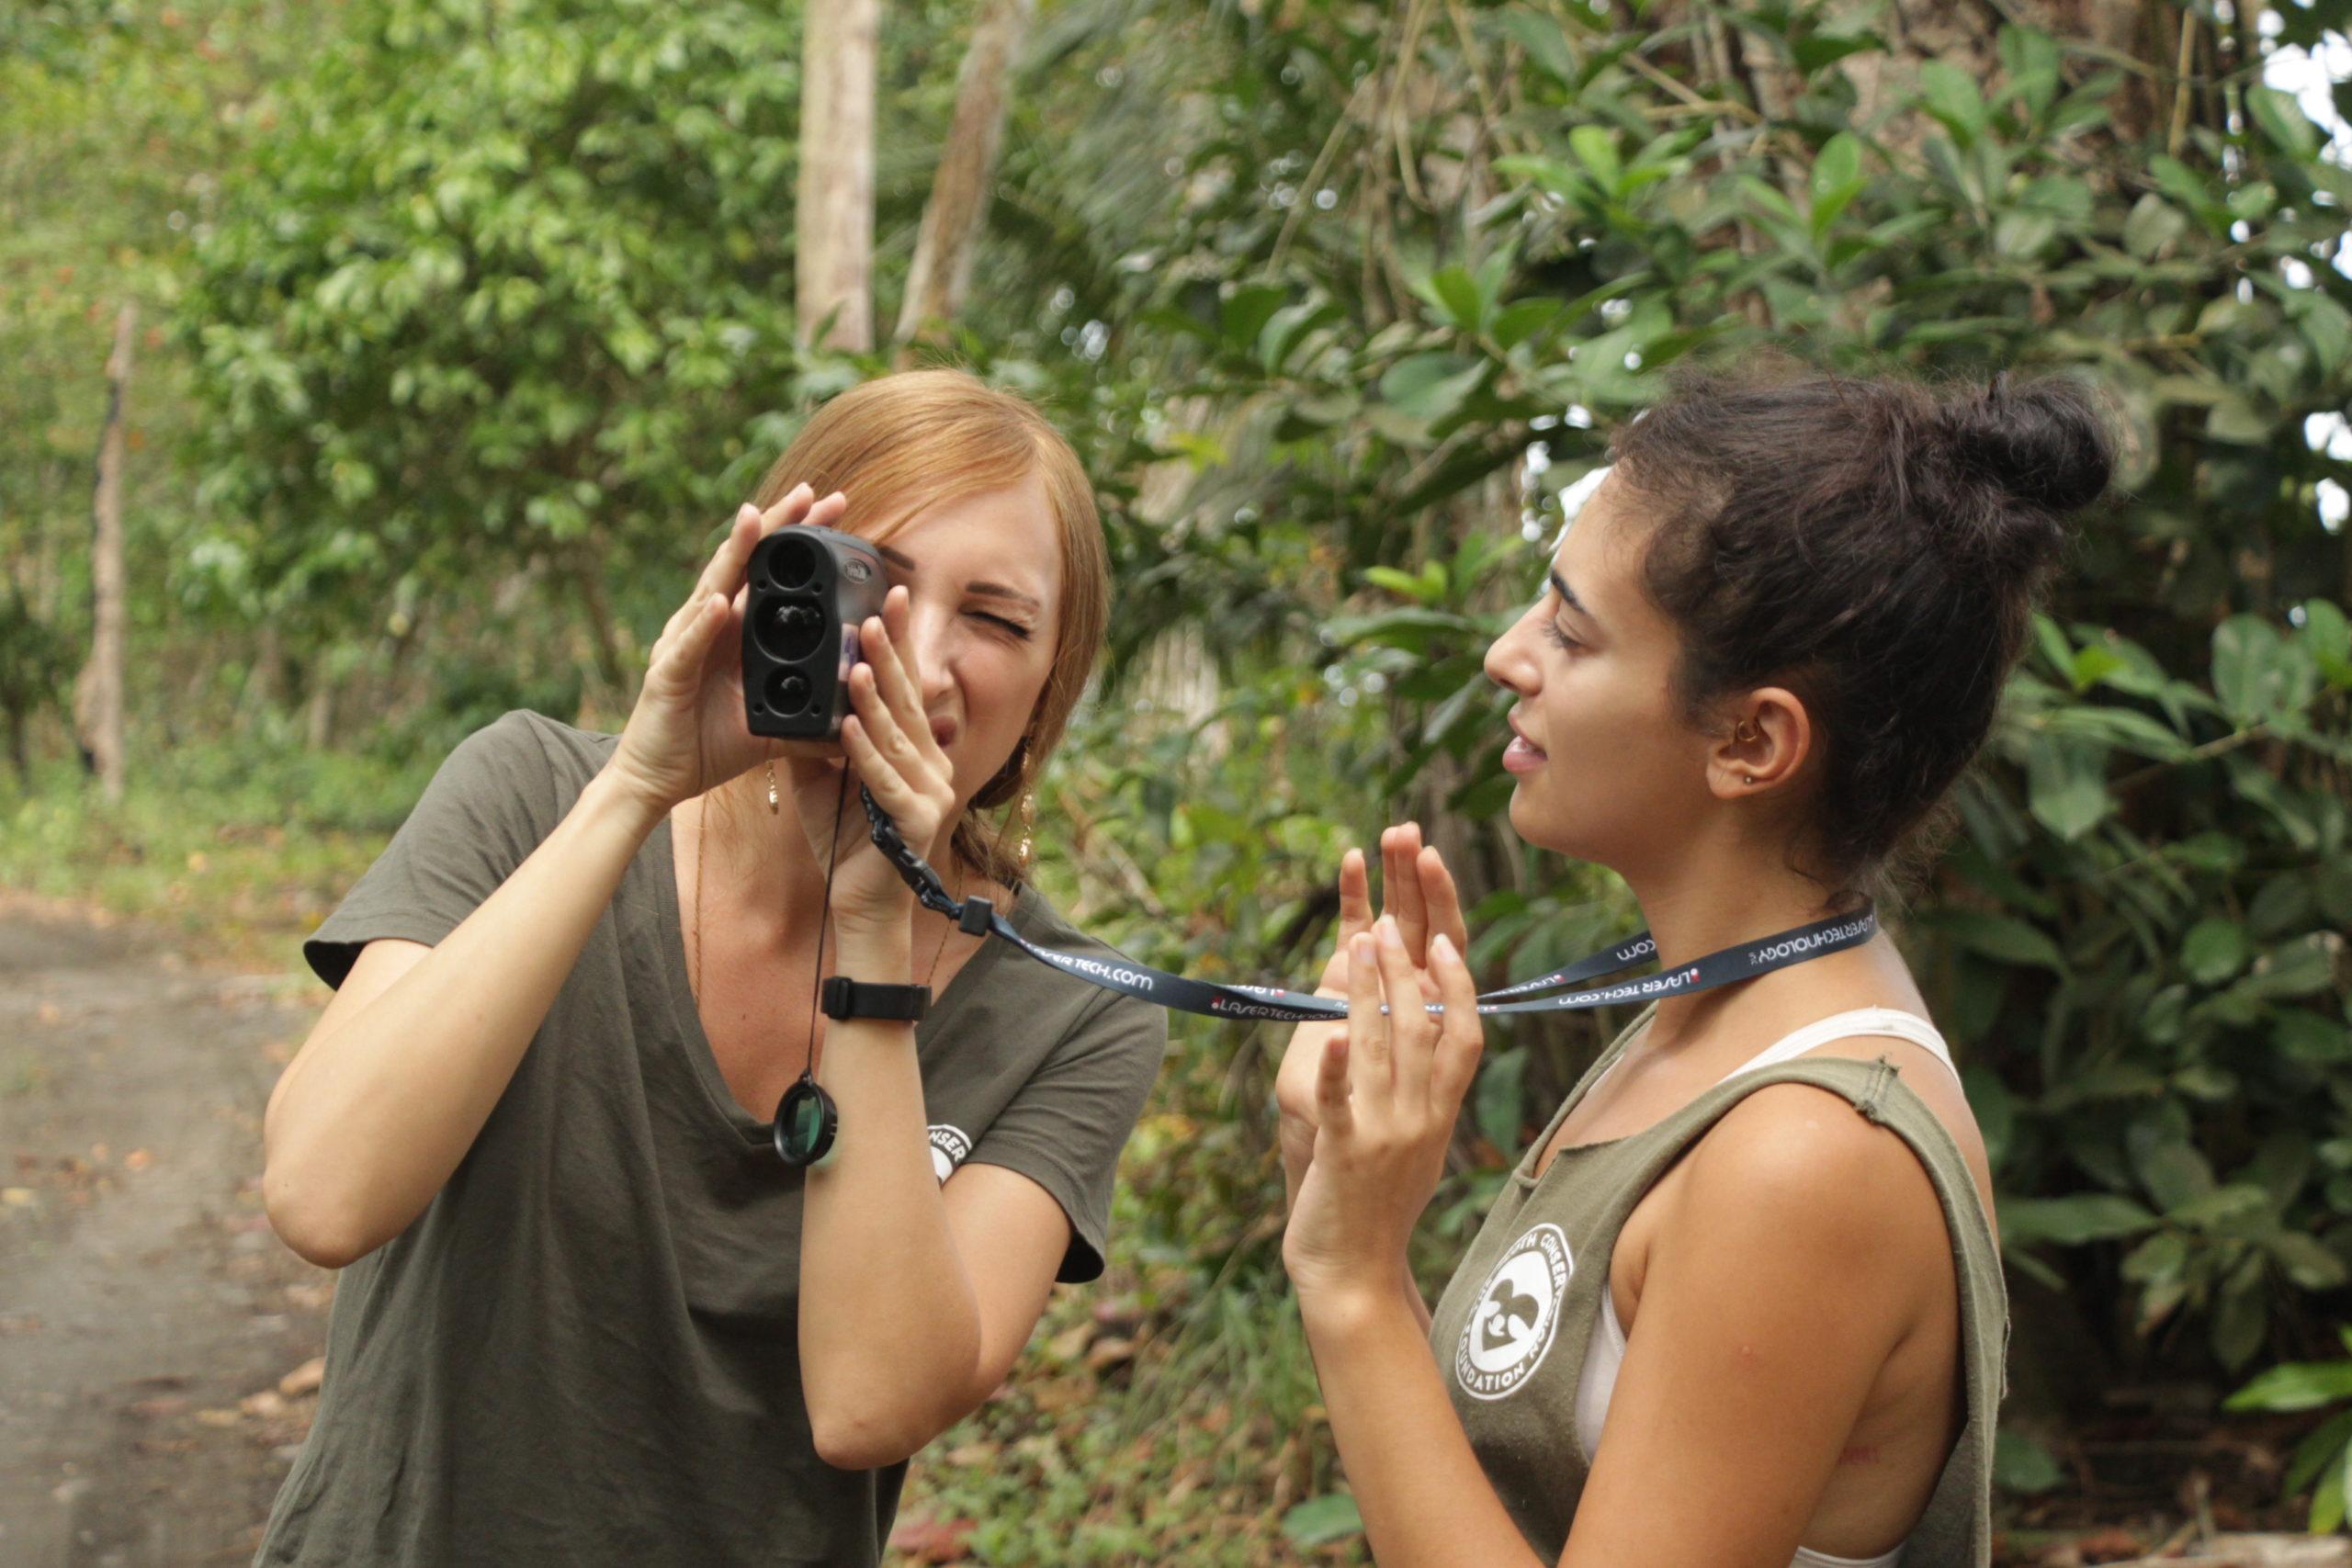 sloth tracking monitoring Amelia